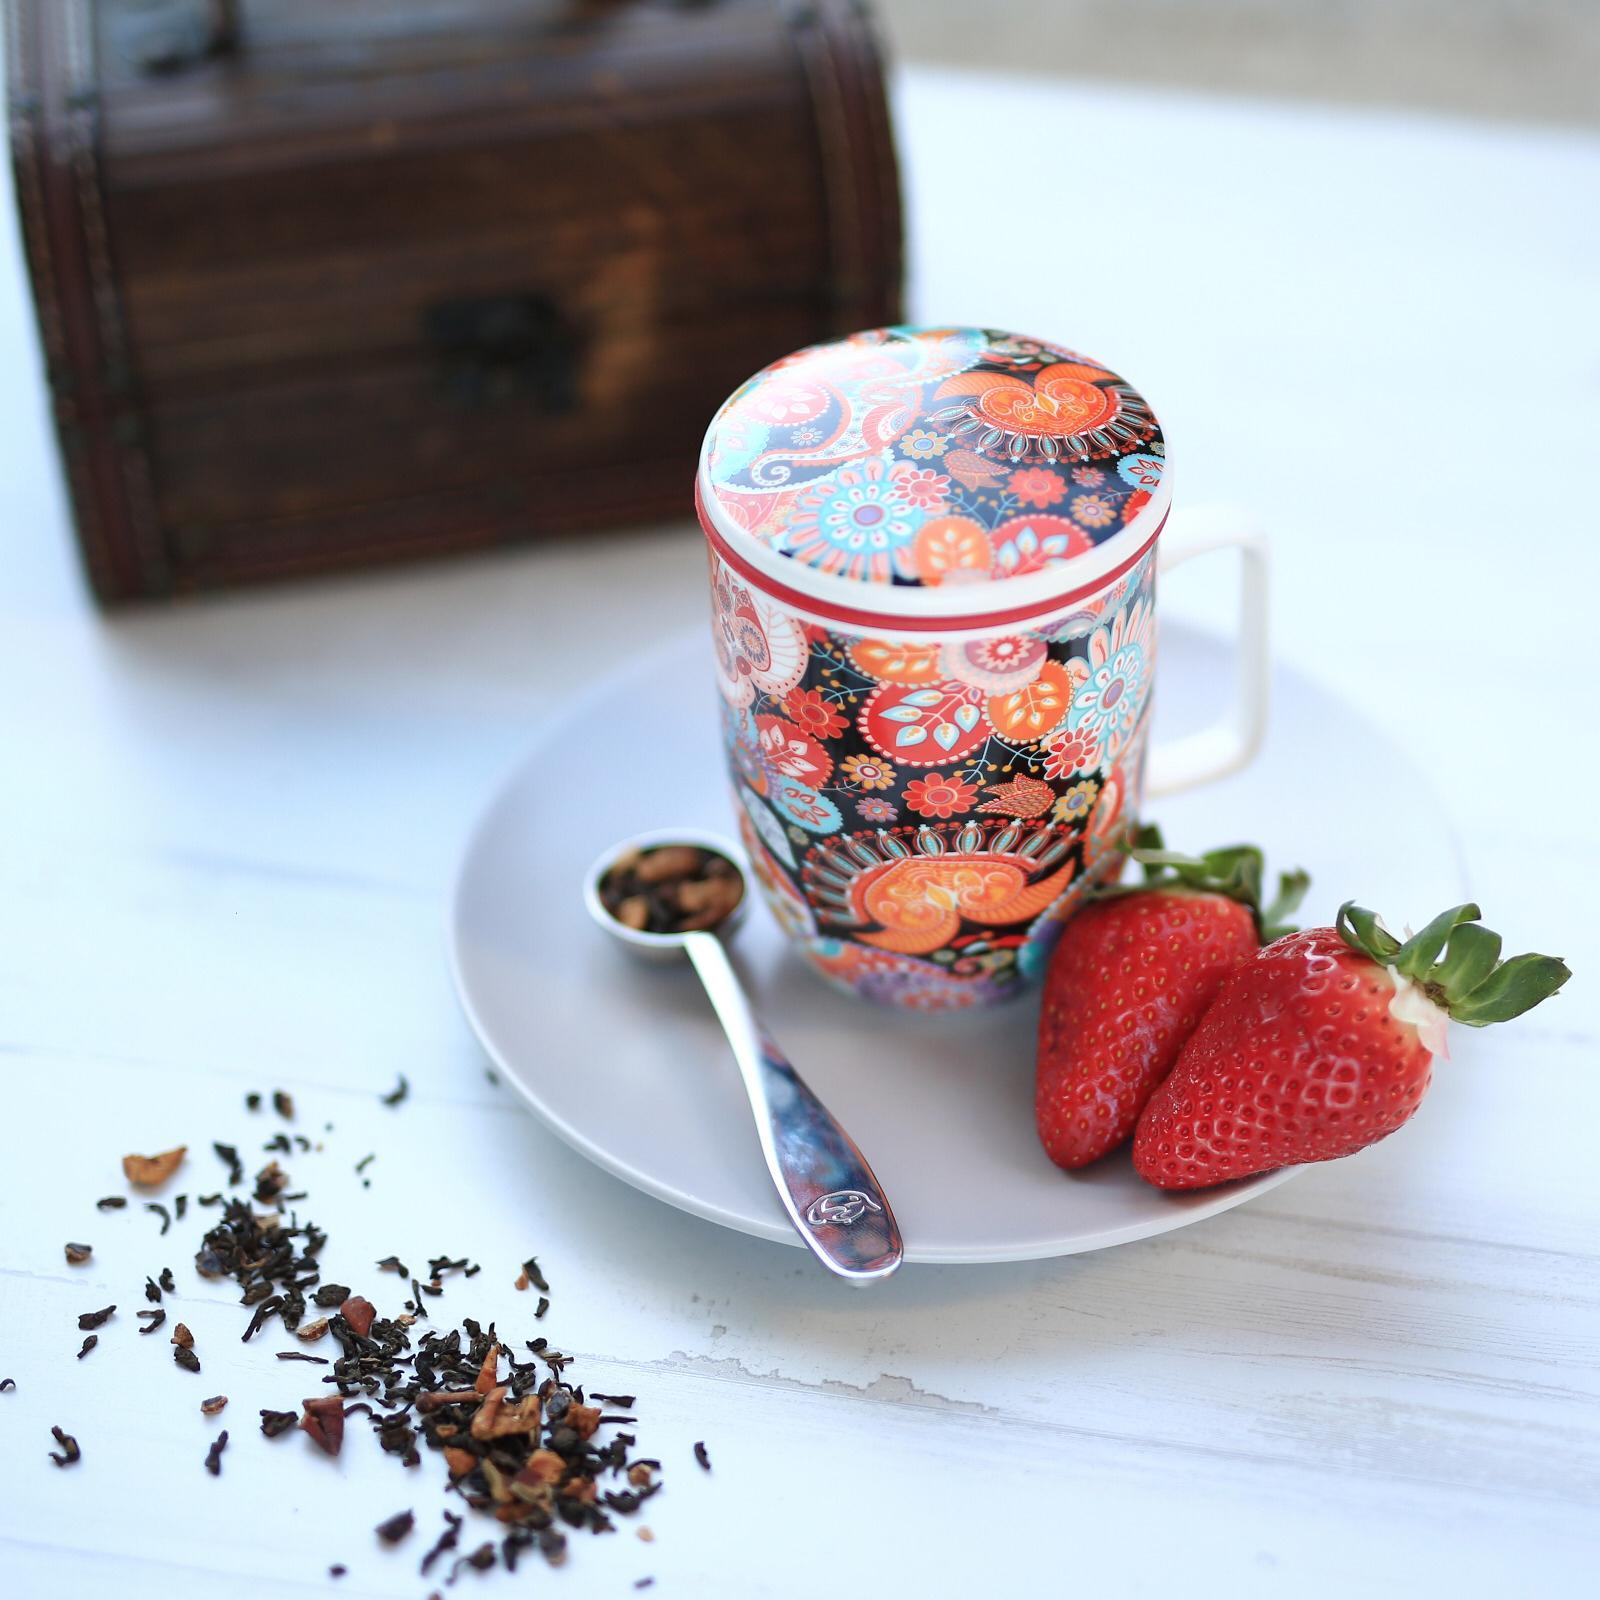 Te Rojo Strawberry Cream - Ítem2